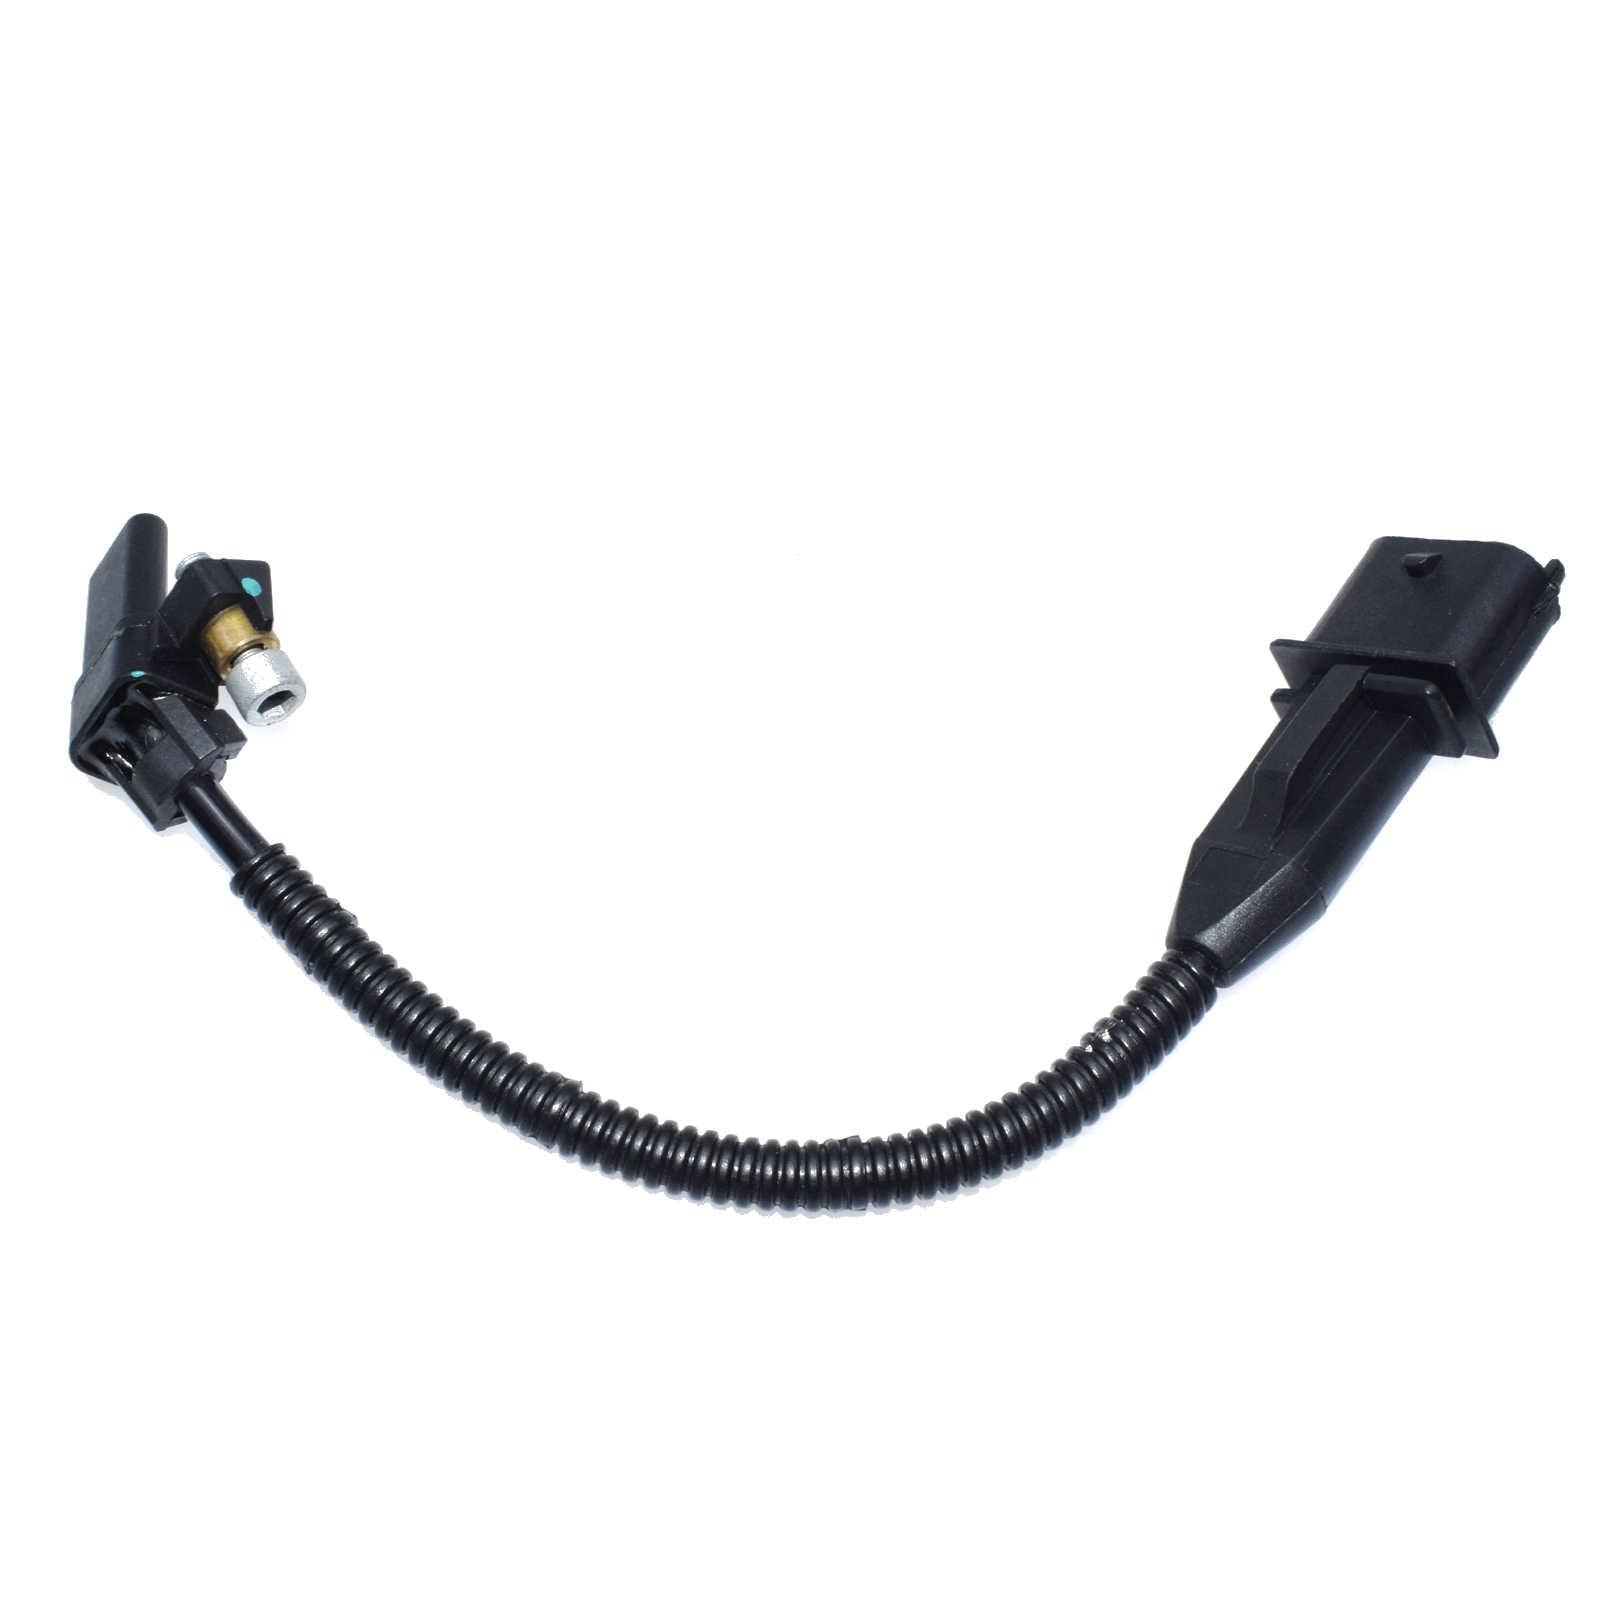 WOLFIGO için krank mili konum sensörü Vauxhall Opel ASTRA INSIGNIA VECTRA ZAFIRA Chevy Aveo5 Pontiac G3 Saturn Fiat 55555806